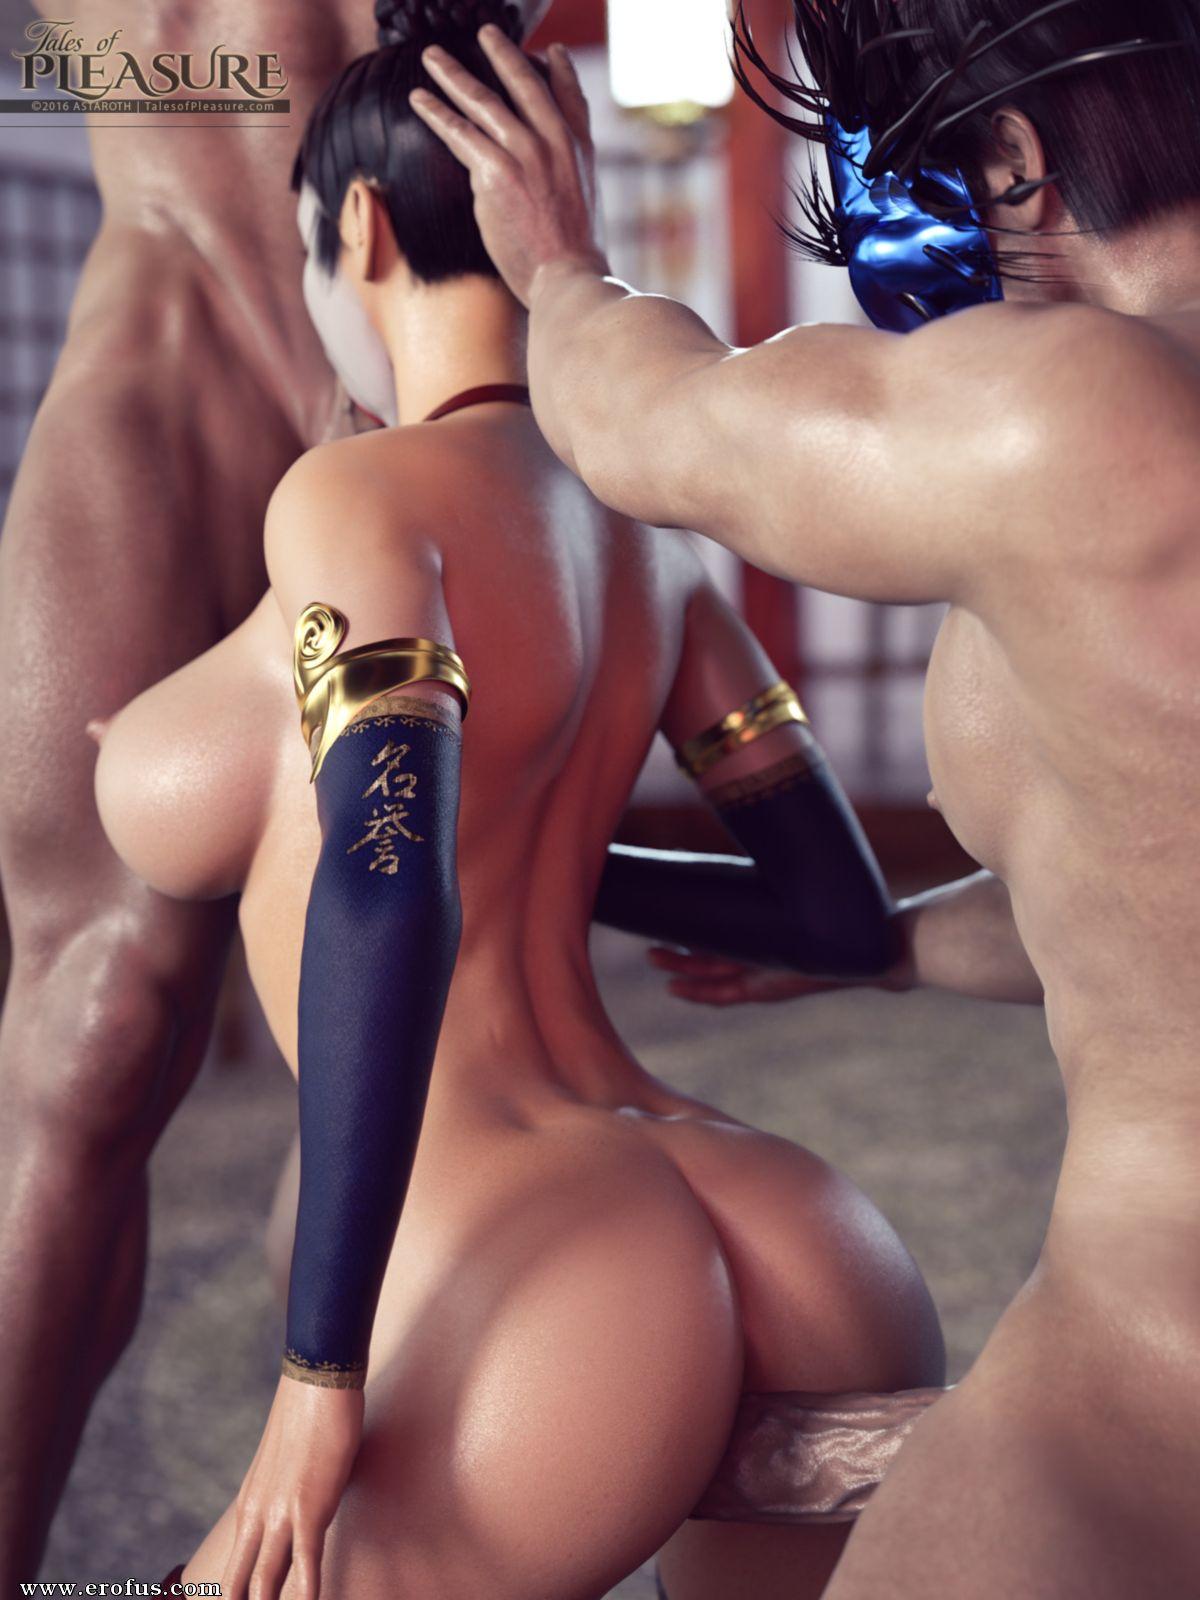 Norah swan blowjob sex in the dojo